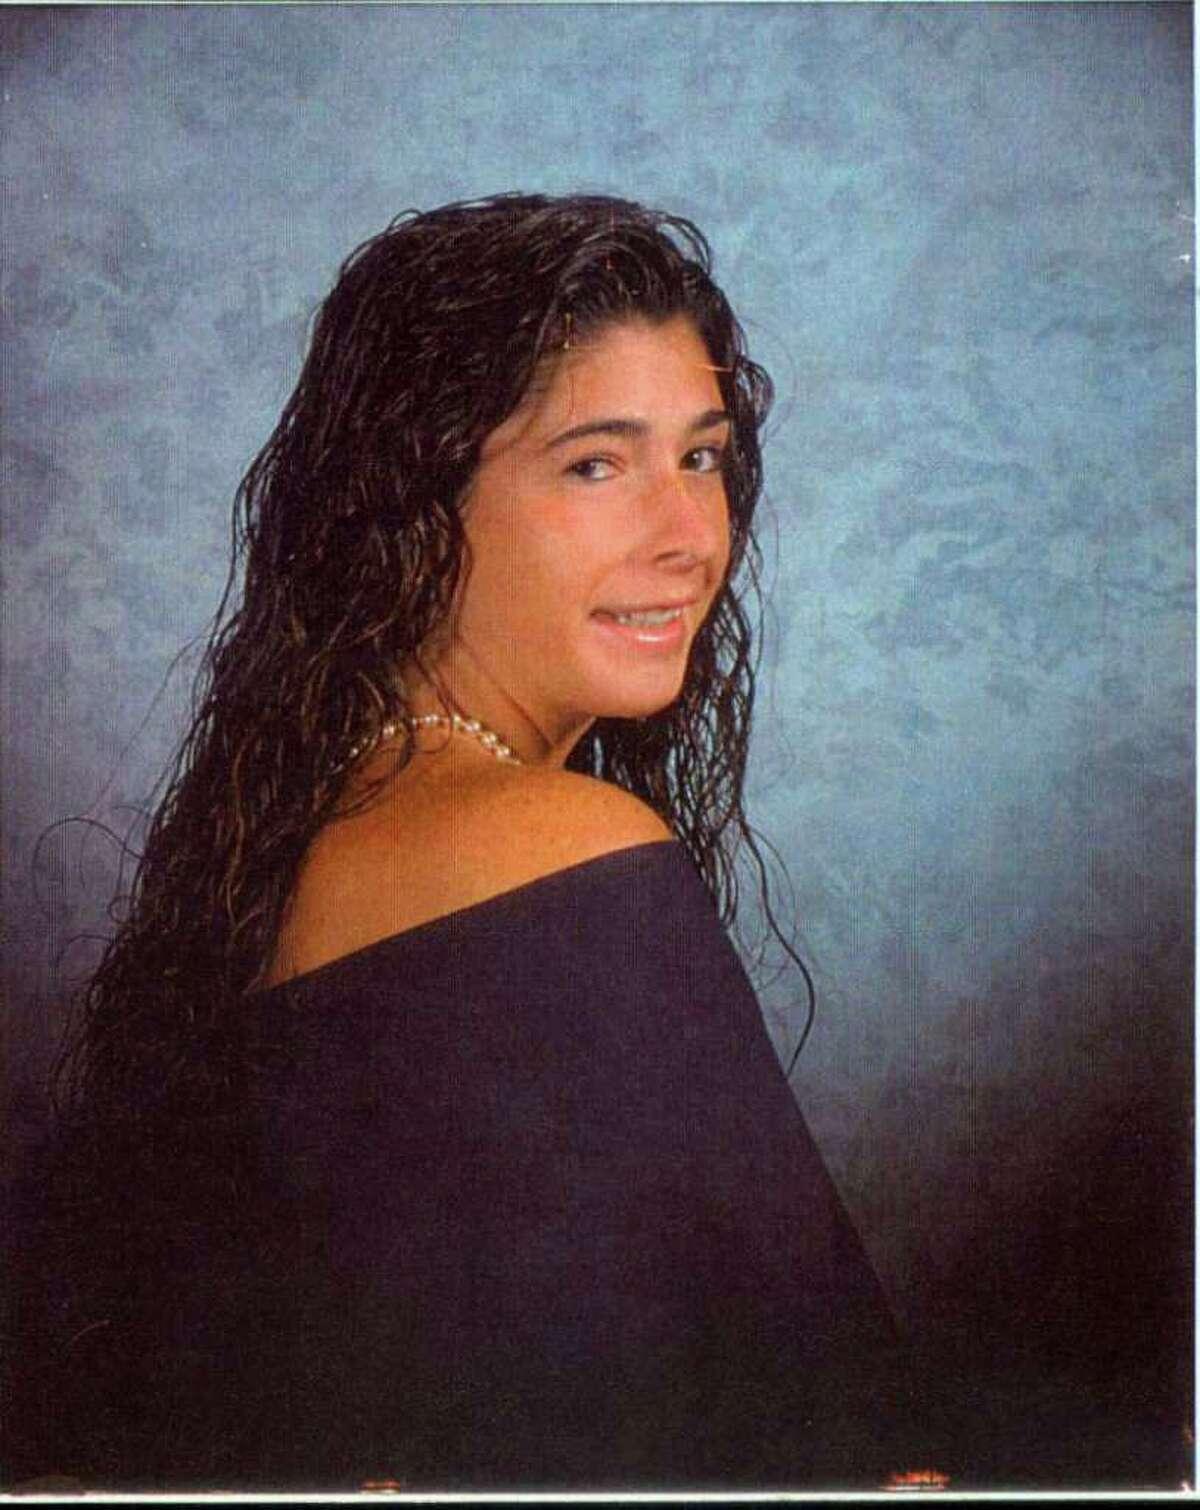 2007 Westhill High School graduation photo of Rachel Sottosanti.